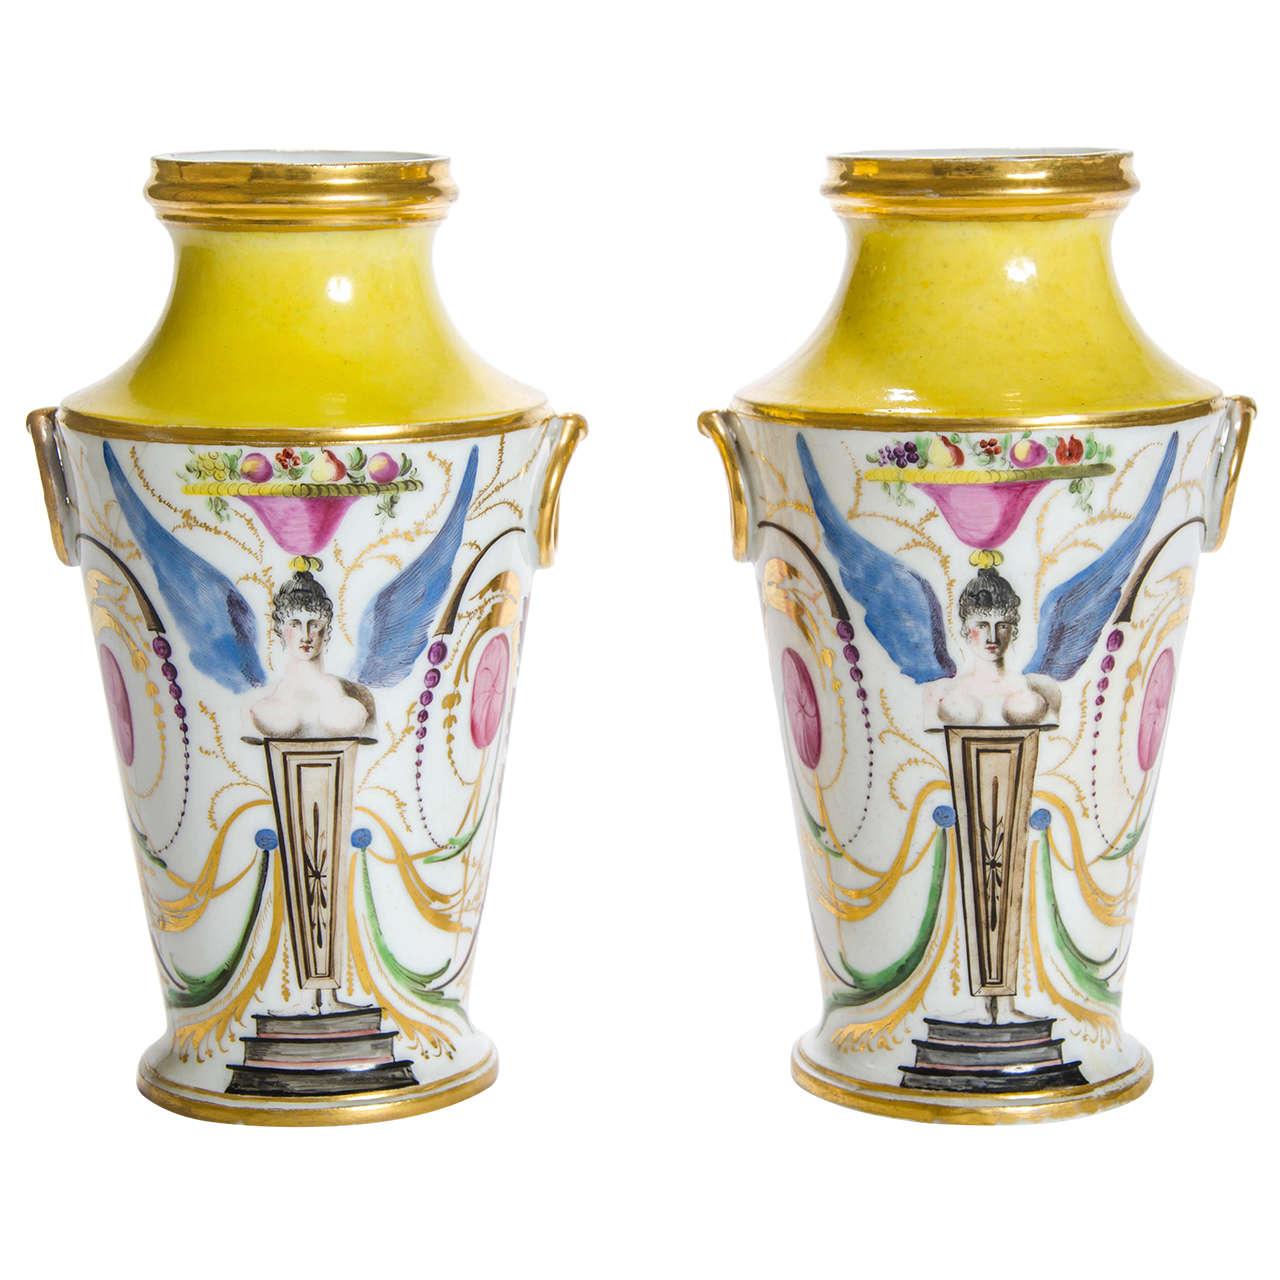 Pair of Yellow and White Ground Porcelain Vases, English, circa 1800